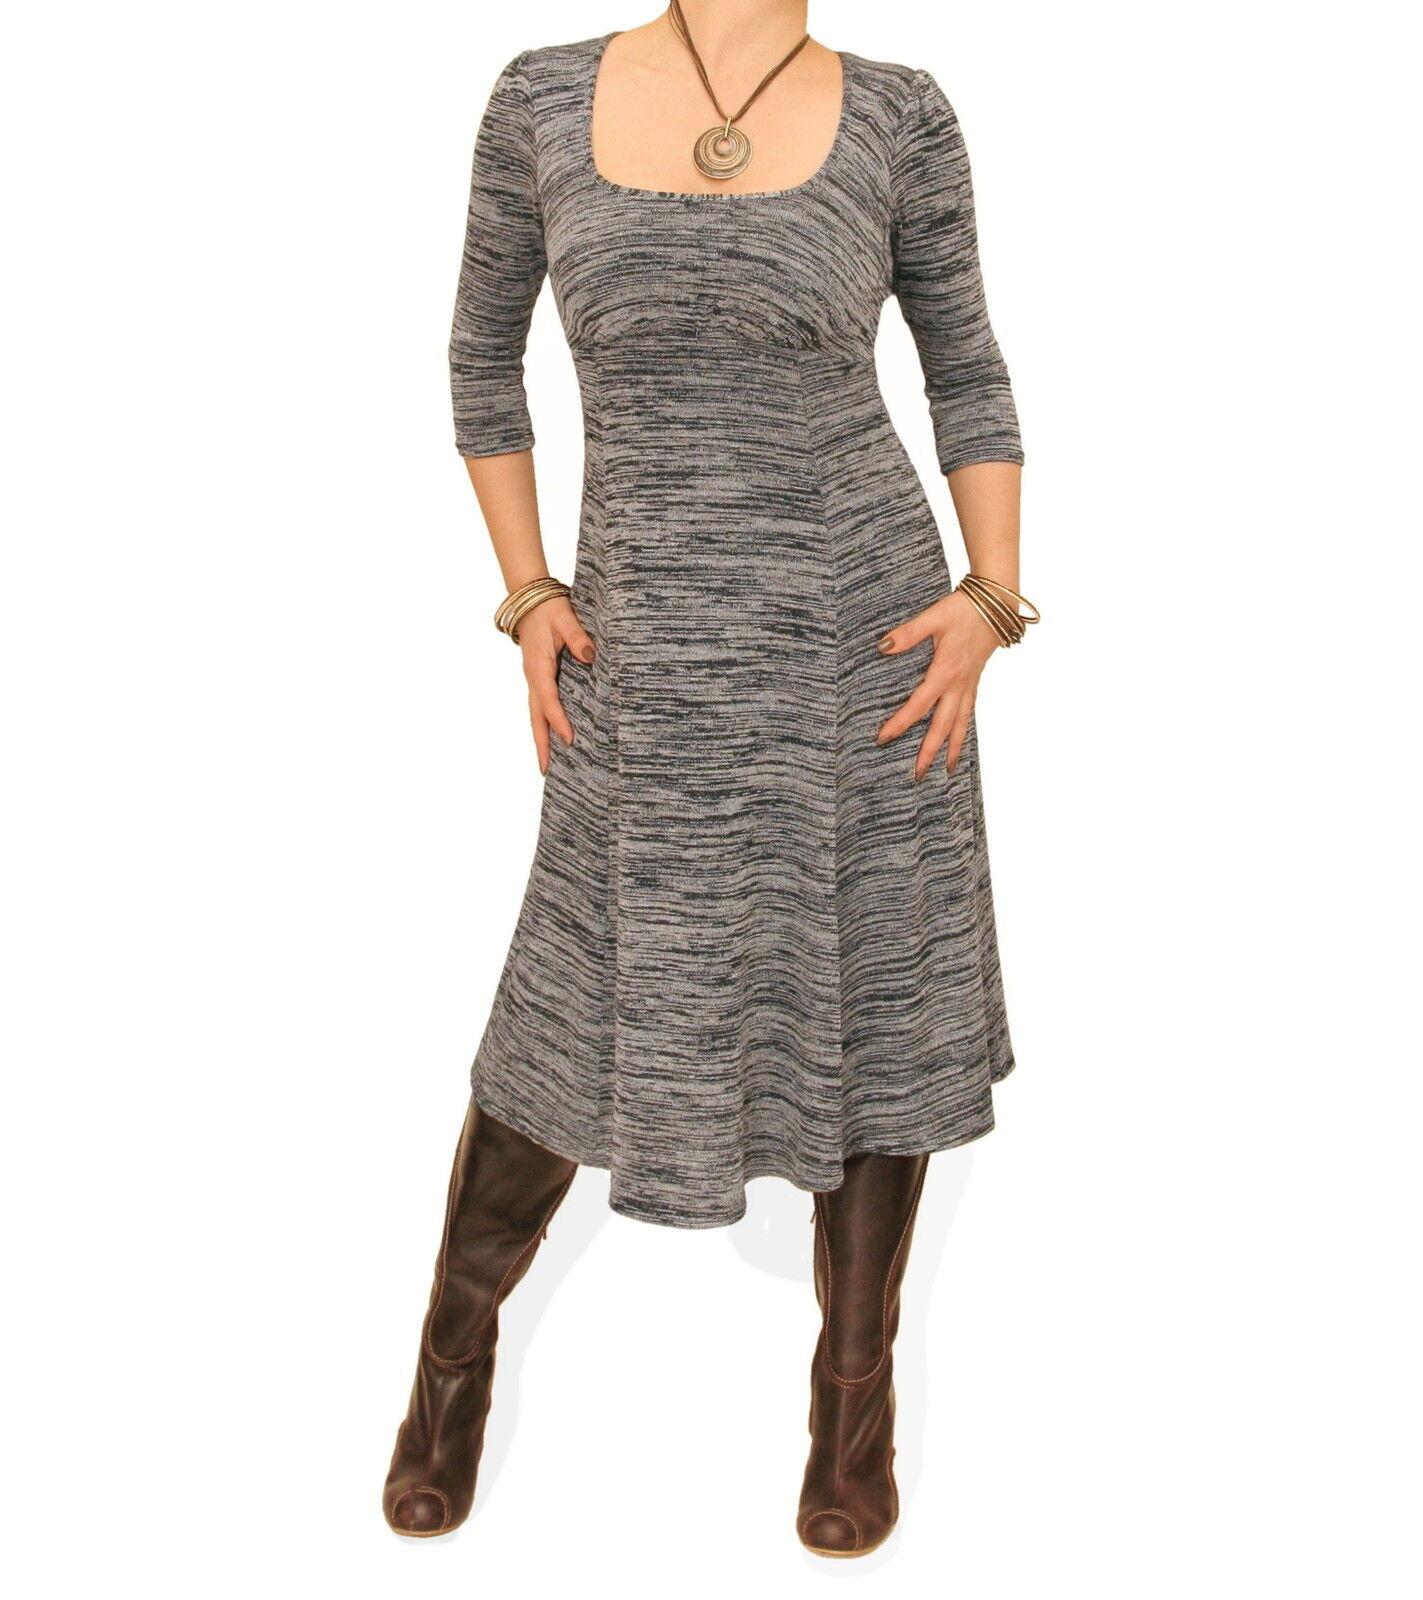 Blau Banana - New grau Marl Knit Fully Lined A Line Dress